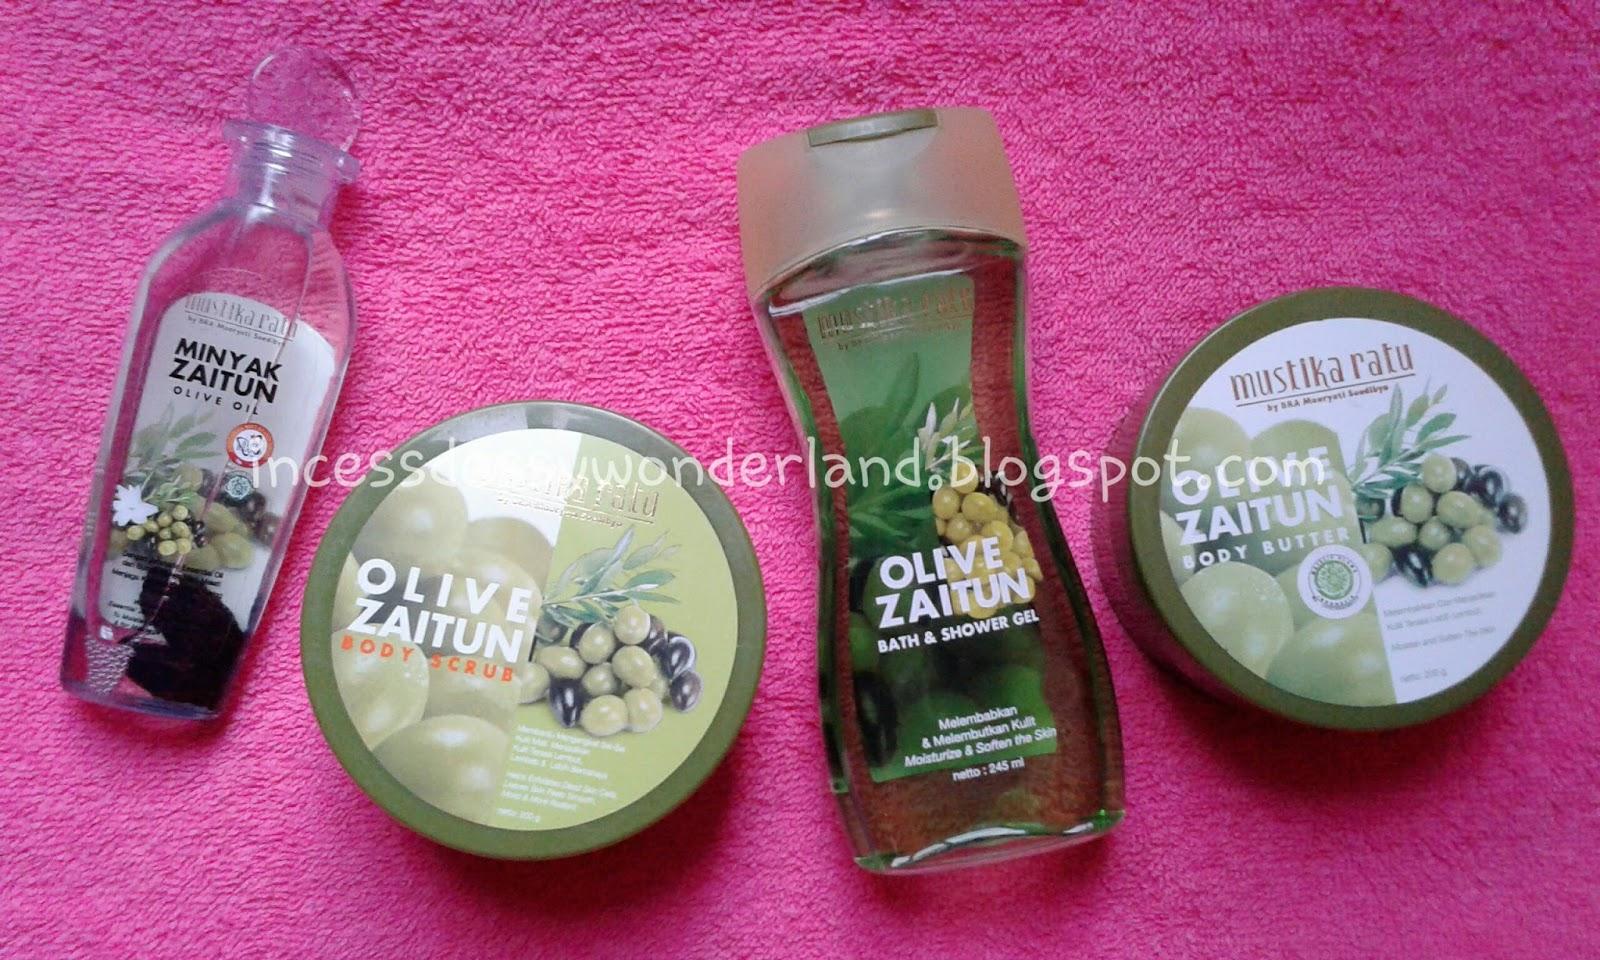 Dessy Journal REVIEW Mustika Ratu Zaitun Body Care